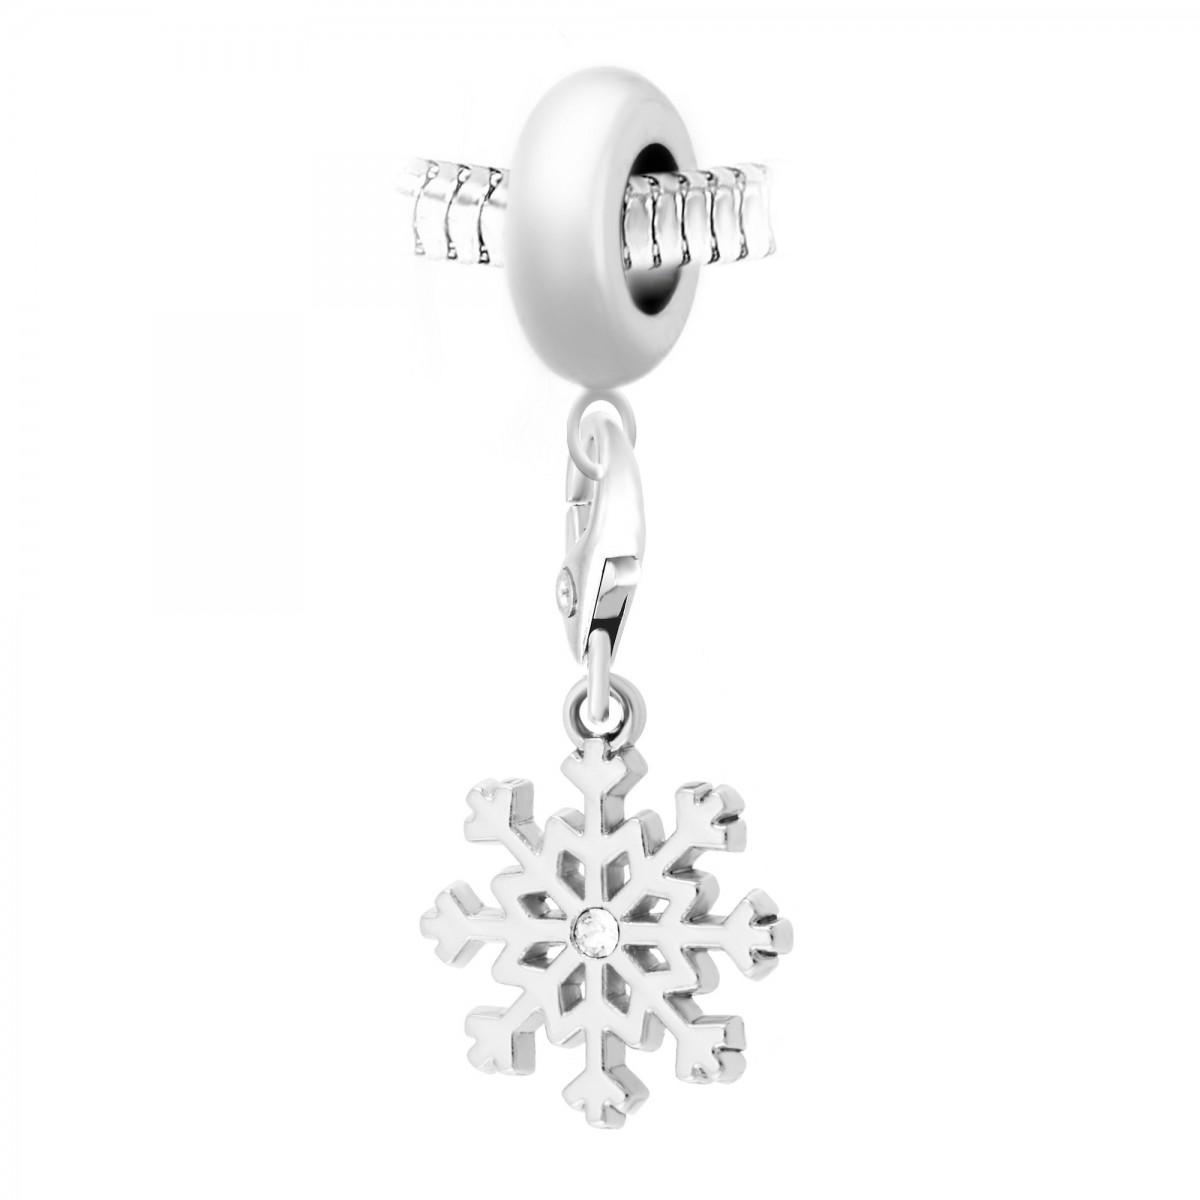 Charm perle So Charm en acier avec pendentif flocon de neige made with Crystal from Swarovski